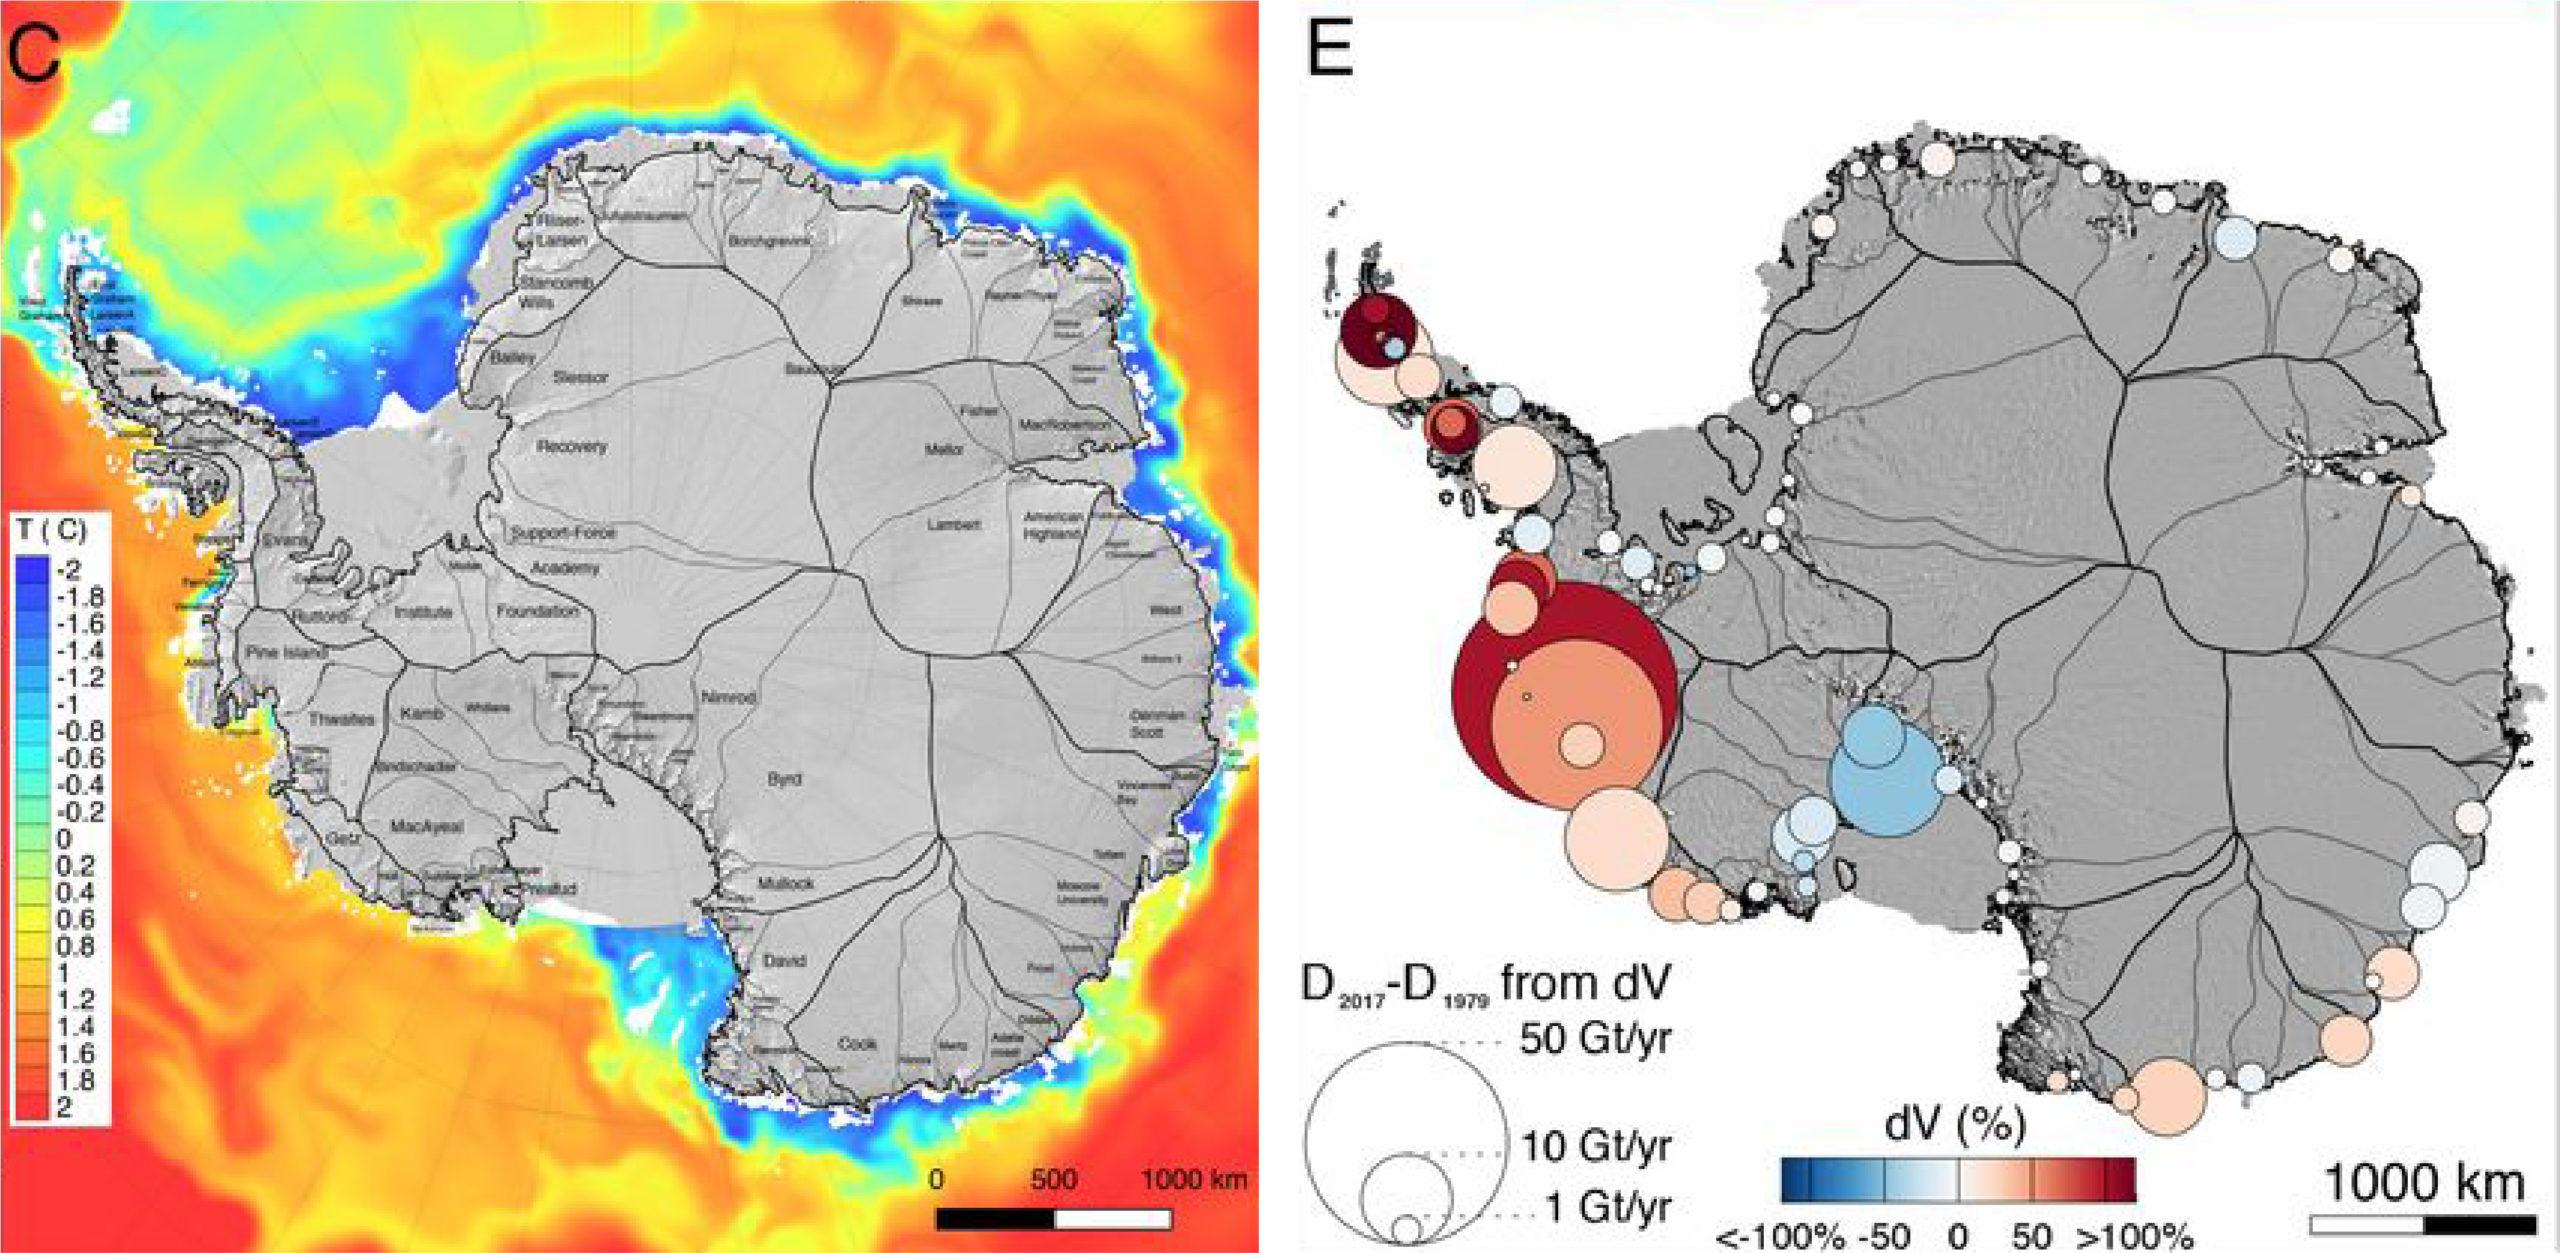 antarctic ocean temperature and ice loss